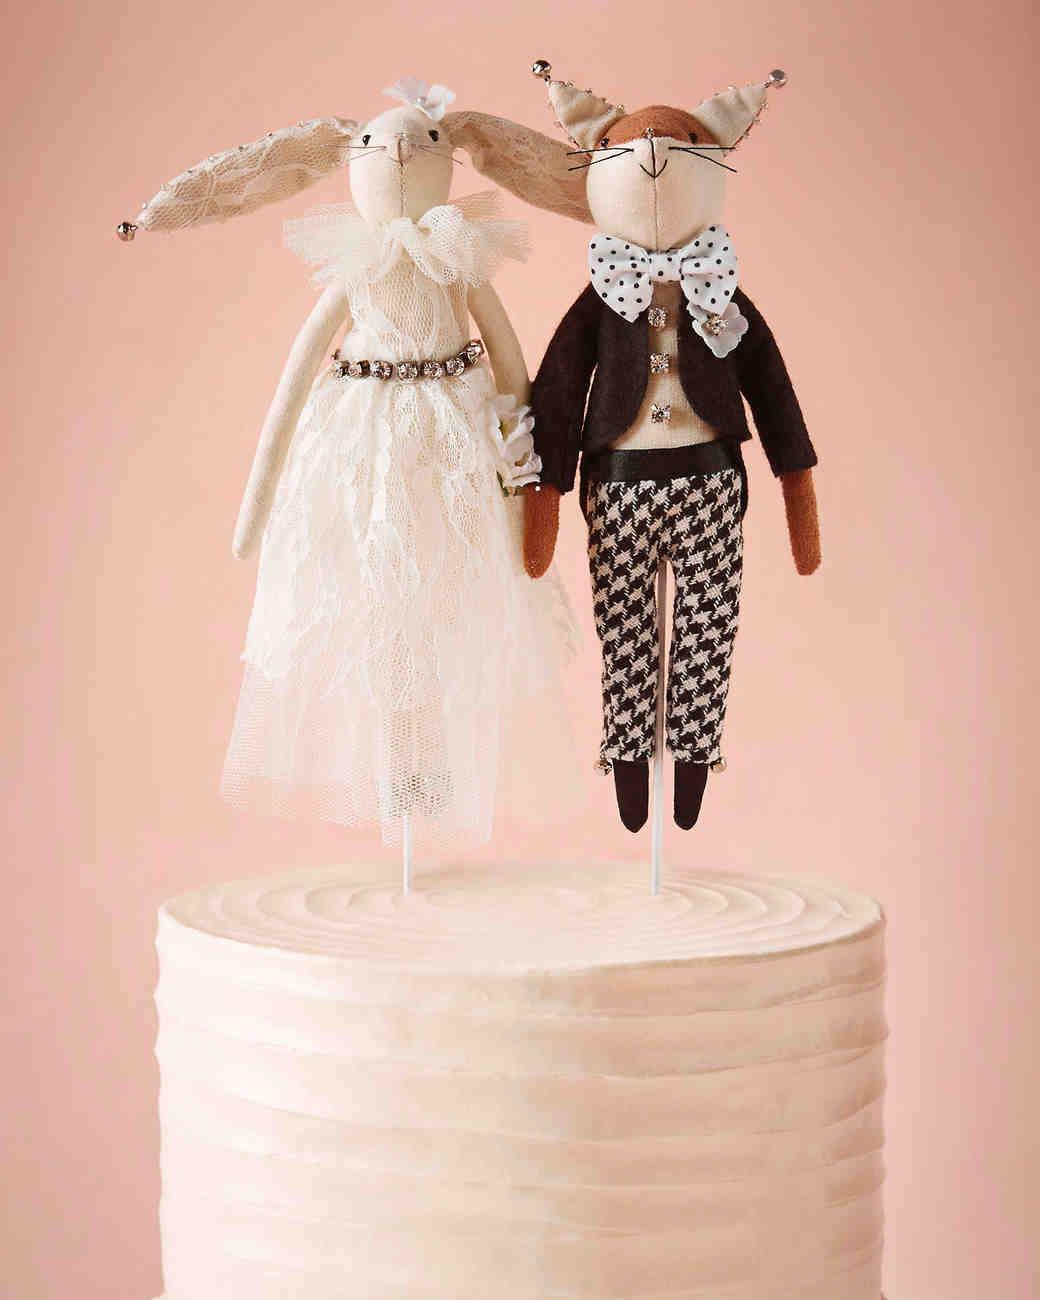 25 Unique Wedding Cake Toppers | Martha Stewart Weddings